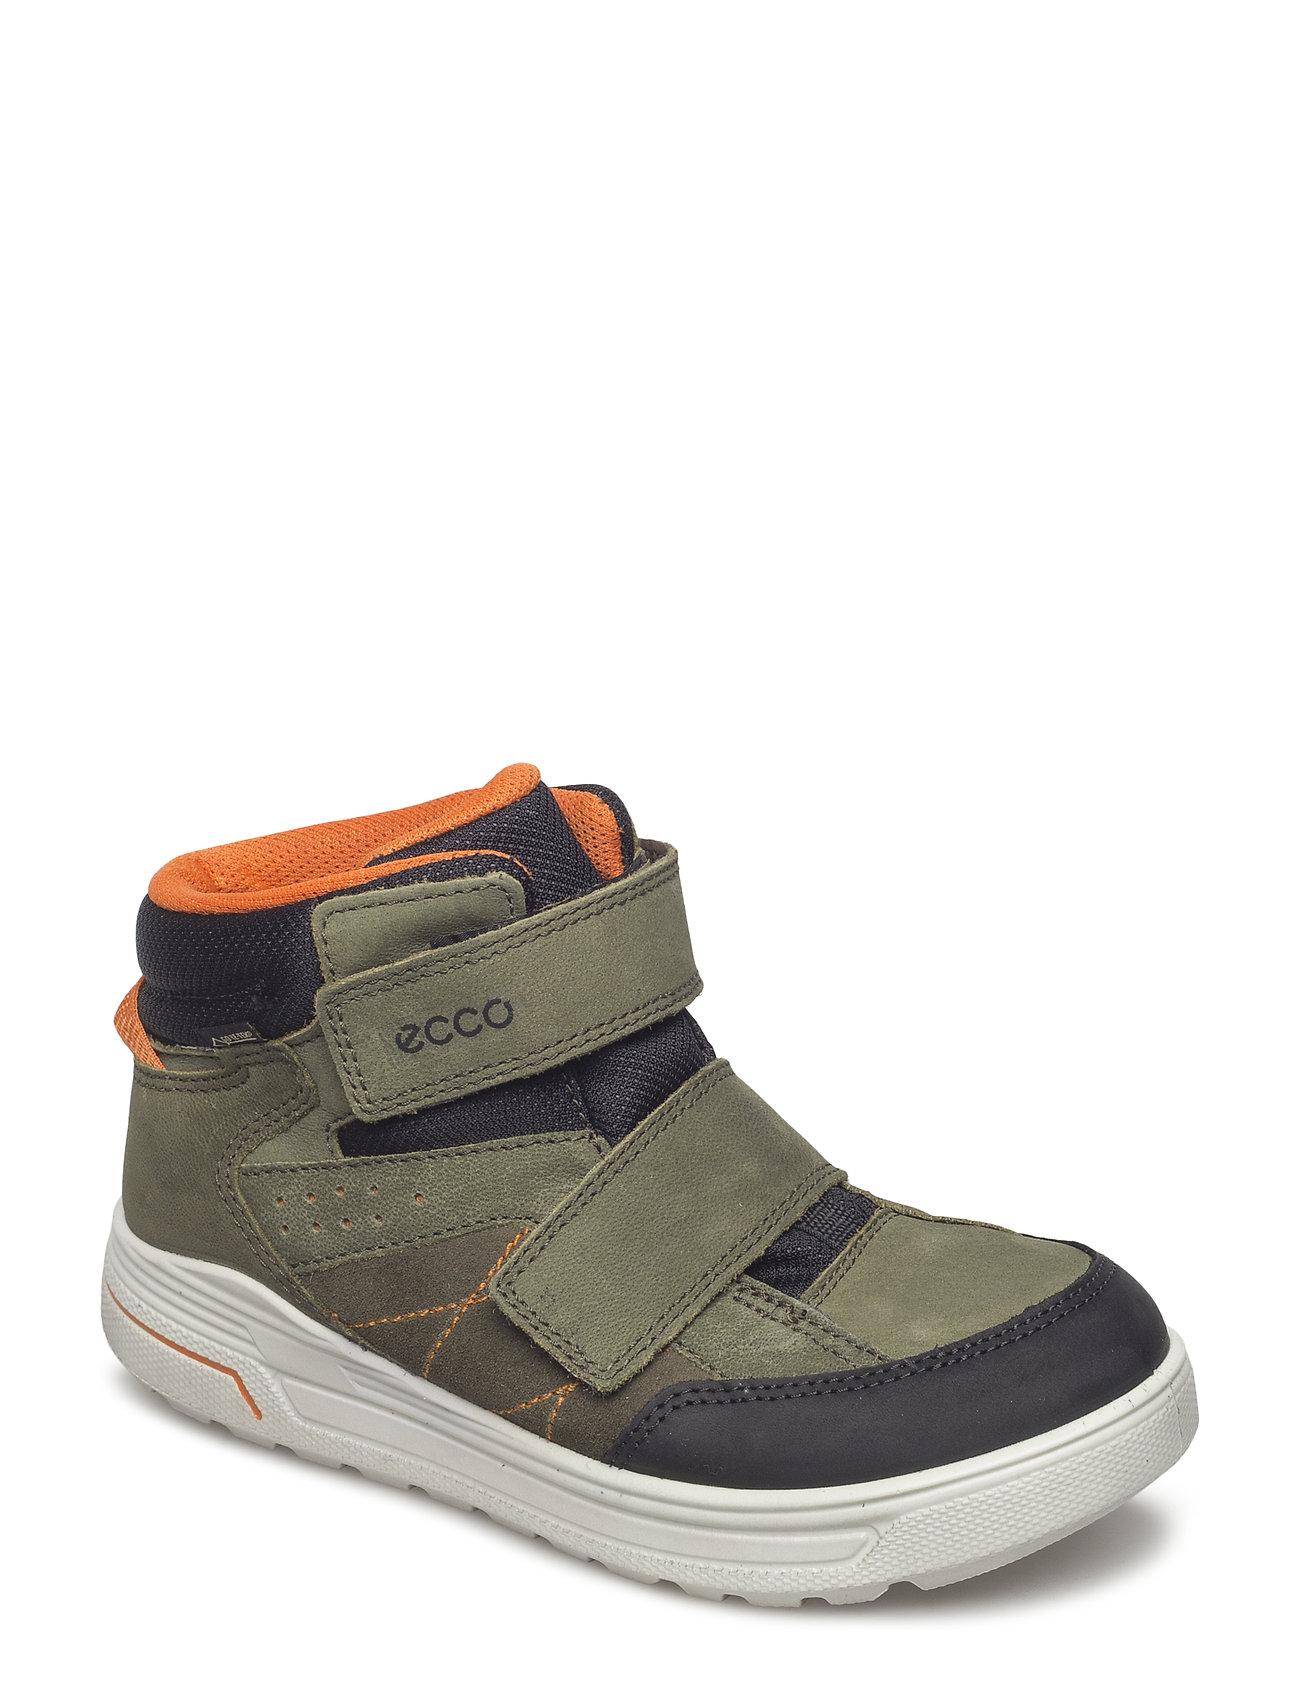 98cc3d7f70a46 Urban Snowboarder (Black grape Leaf) (£43.80) - ECCO -